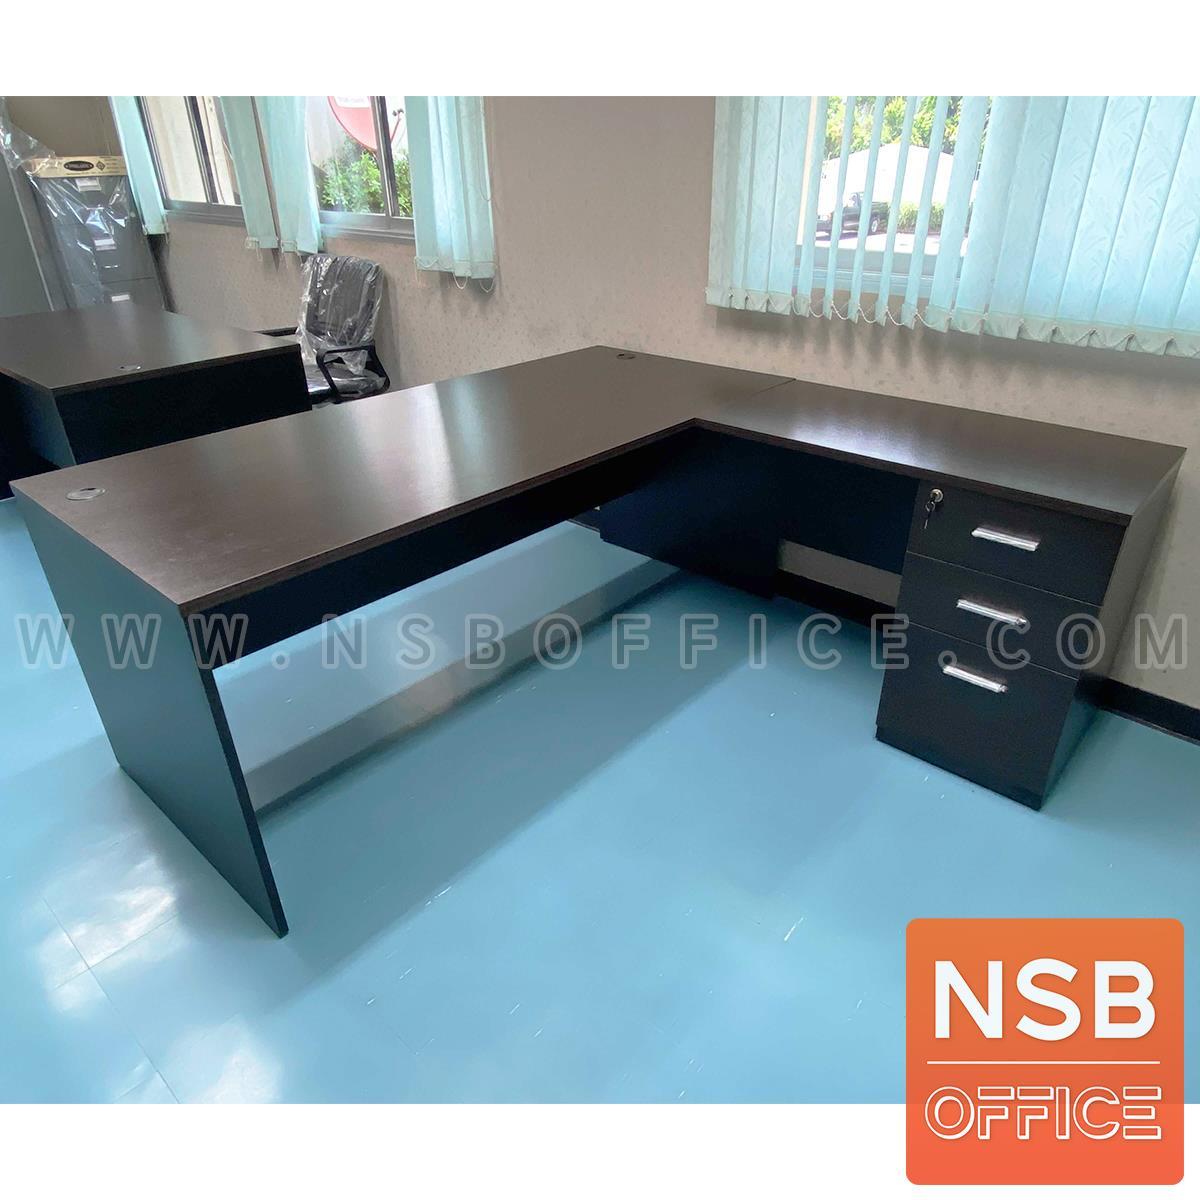 A30A039:โต๊ะผู้บริหารตัวแอล รุ่น Bonita (โบนิต้า) ขนาด 180W*180D cm. พร้อม 3 ลิ้นชักข้าง กุญแจล็อกรวม